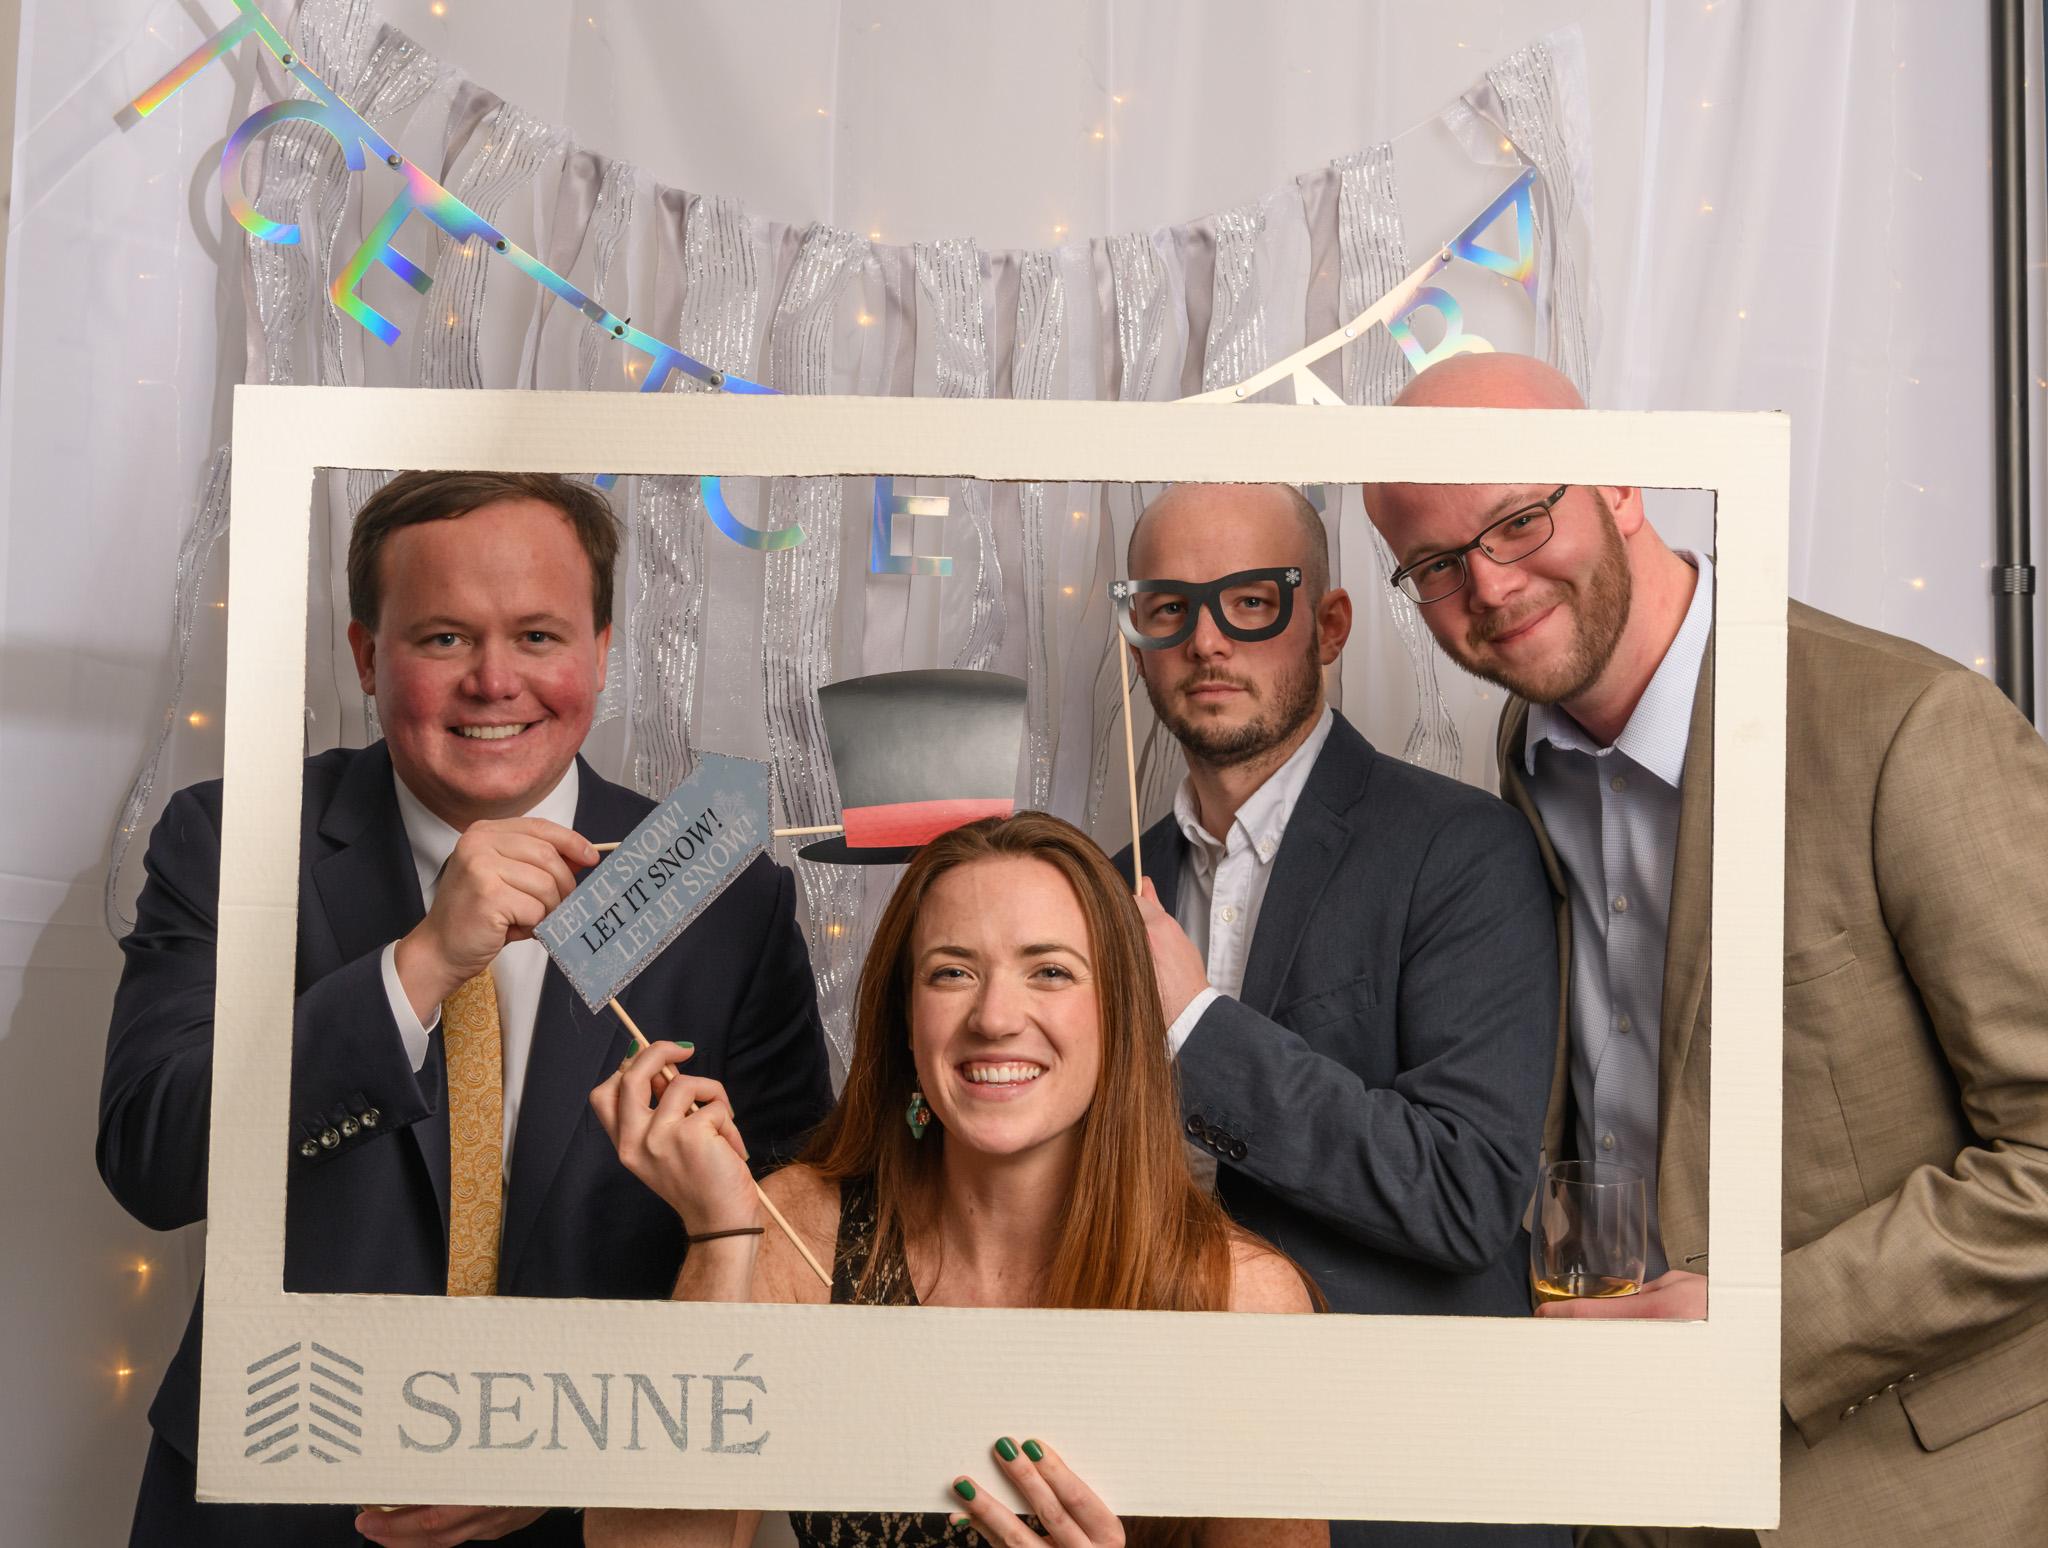 senne-winter-party-2018--0058.jpg